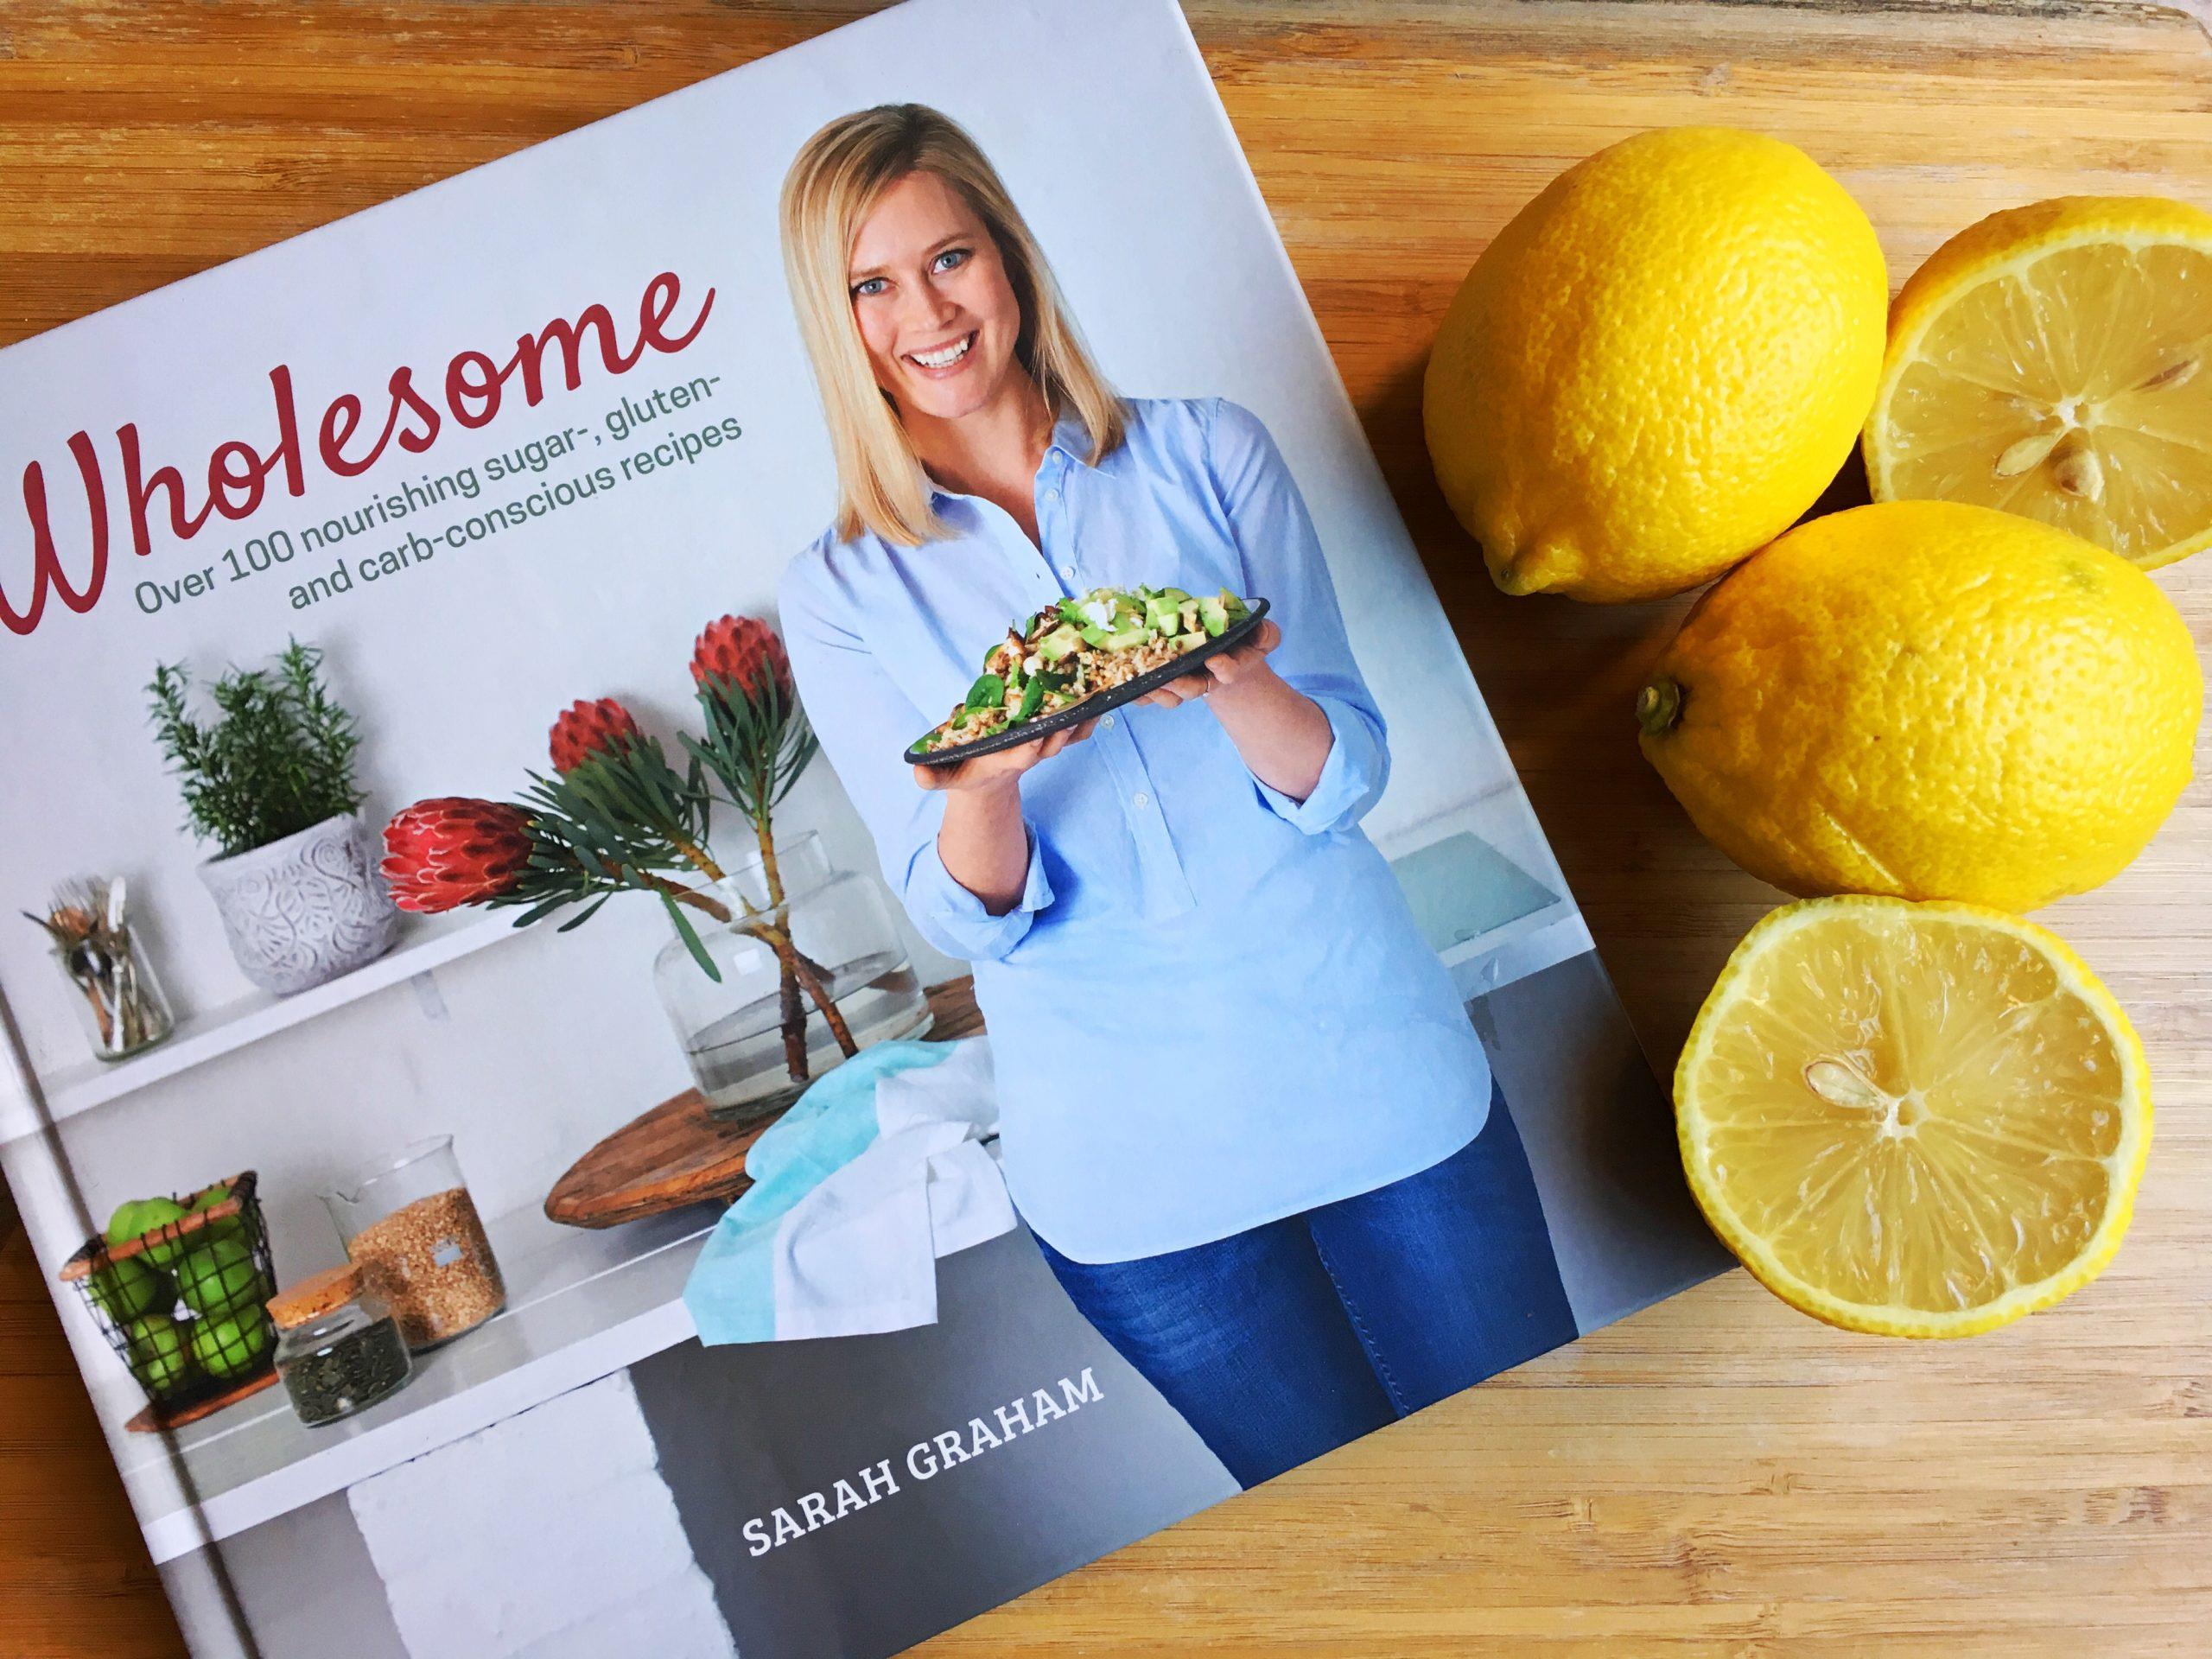 Fresh Wholesome recipe ideas with Sarah Graham